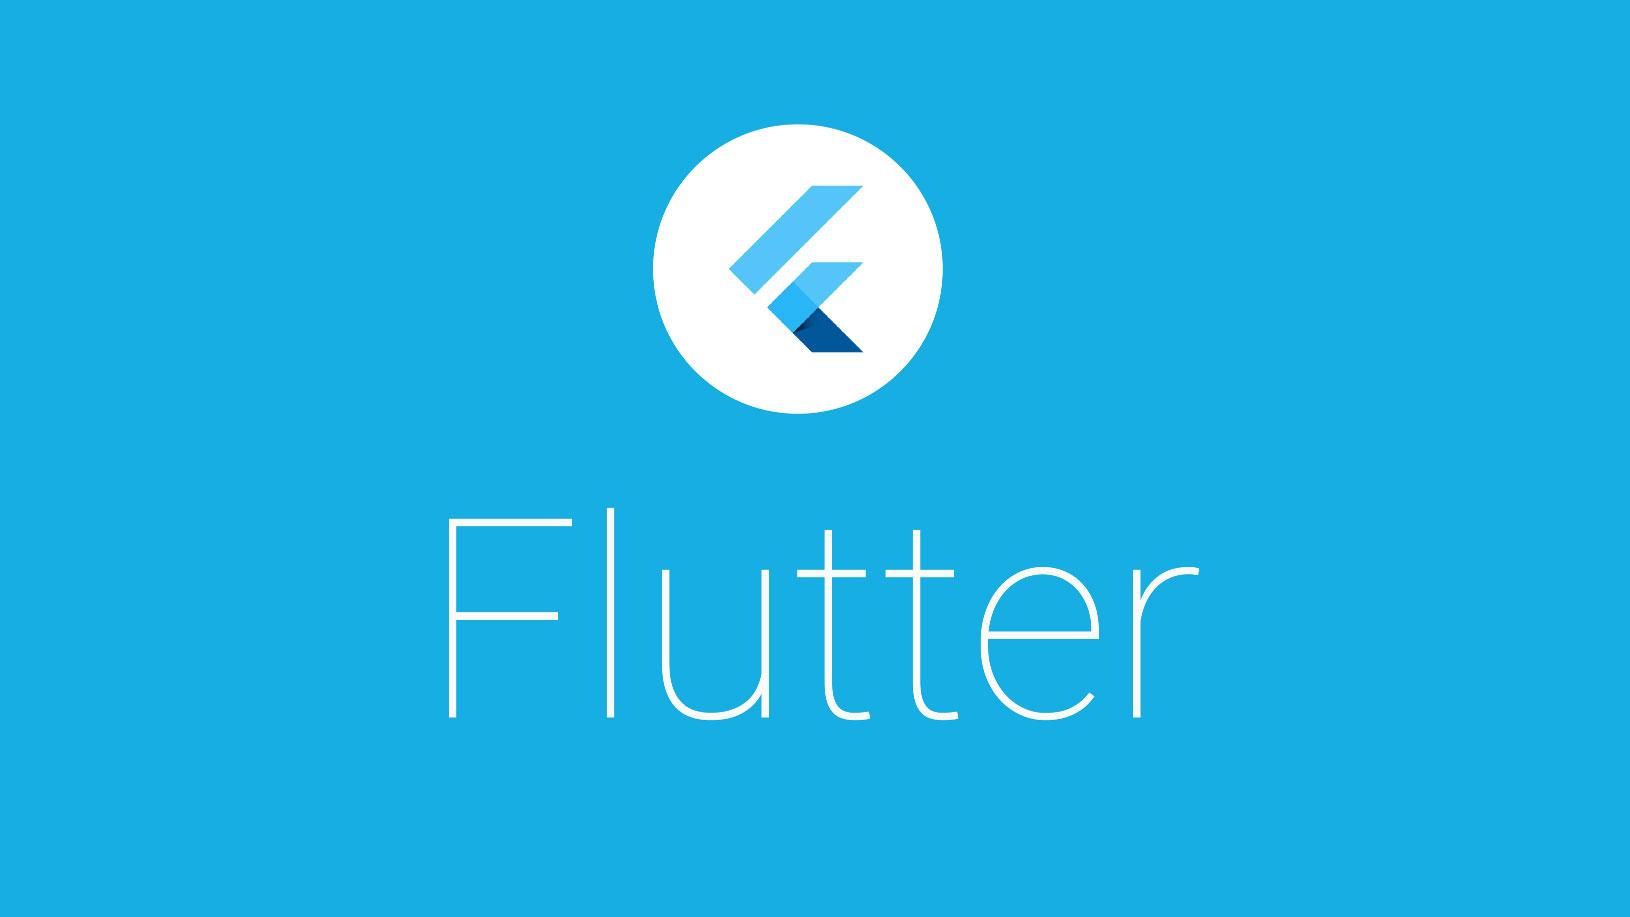 Build cross-platform mobile apps with Google's Flutter | Creative Bloq